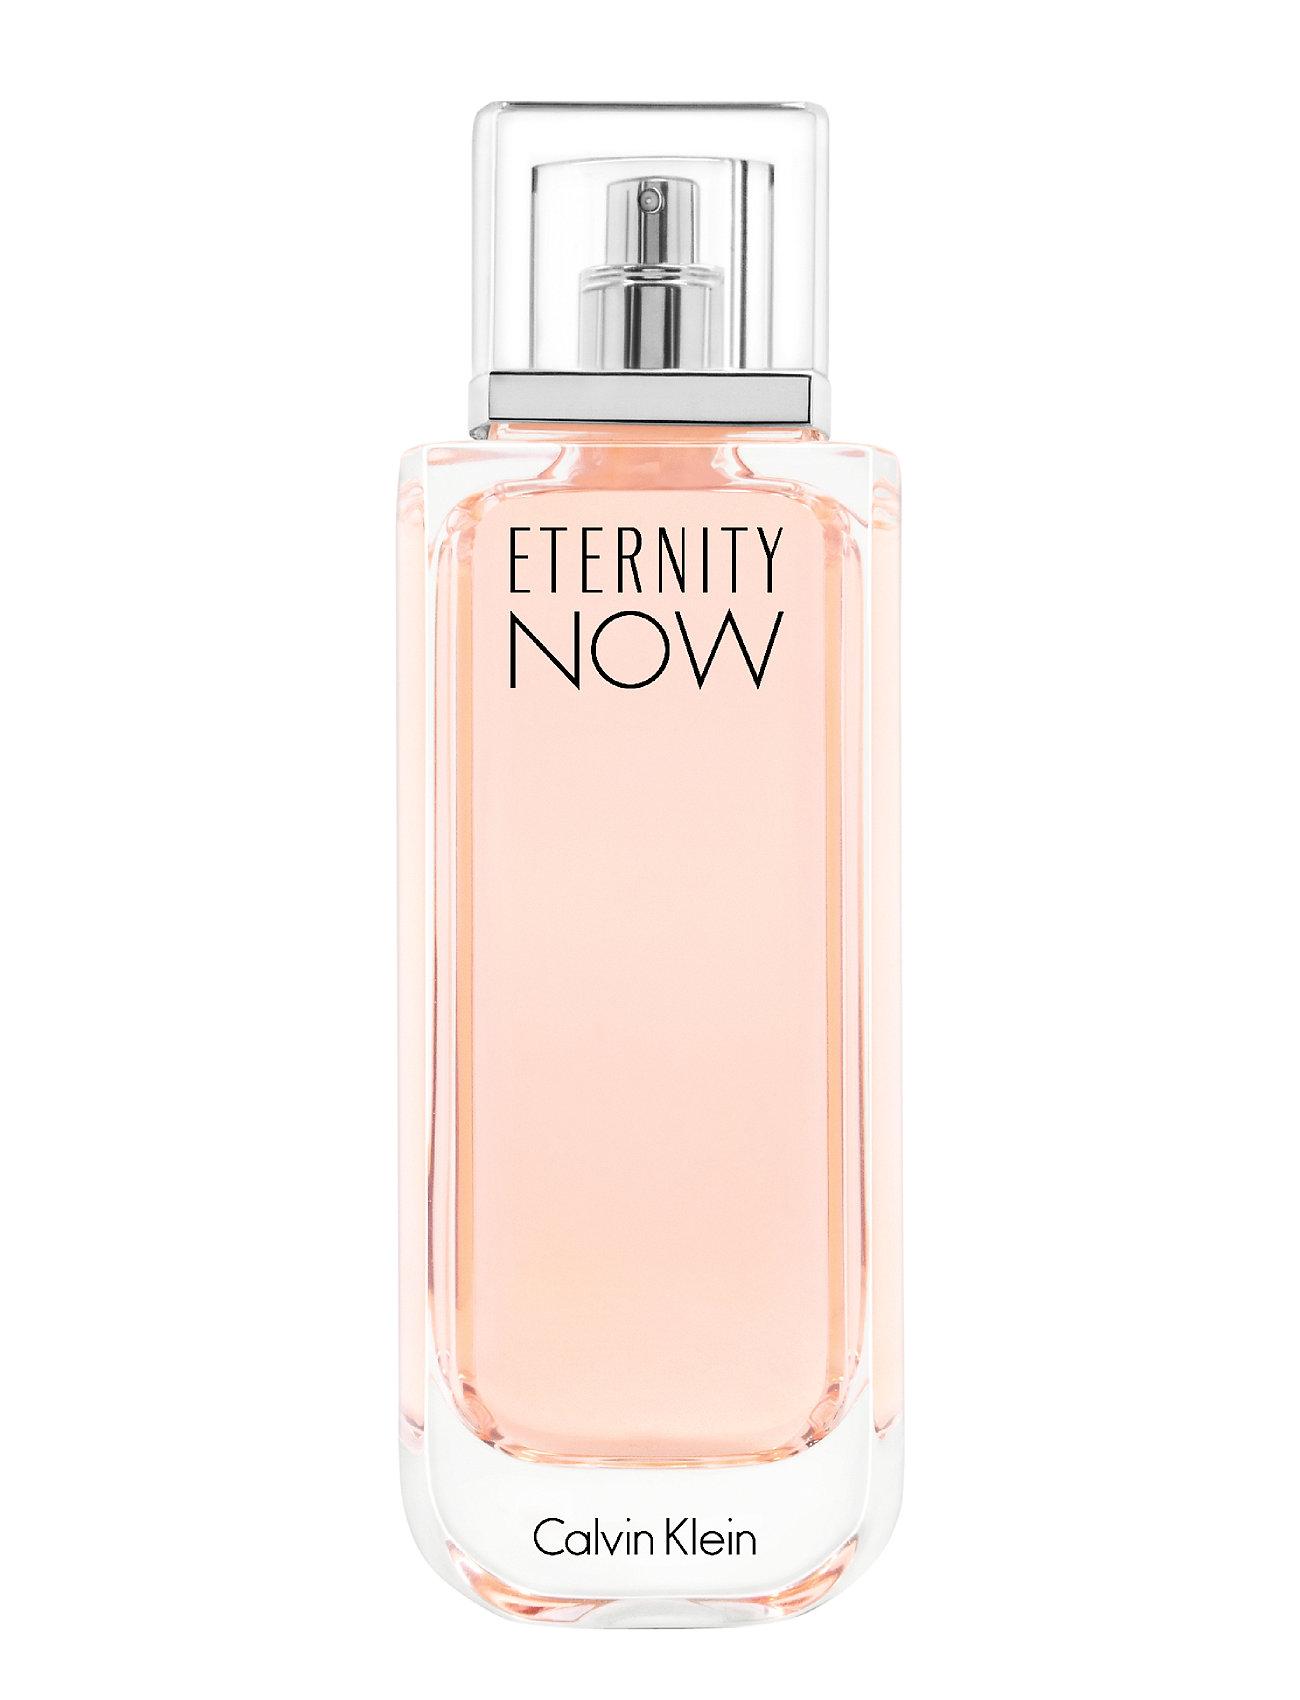 Calvin klein eternity woman now eau fra calvin klein fragrance på boozt.com dk